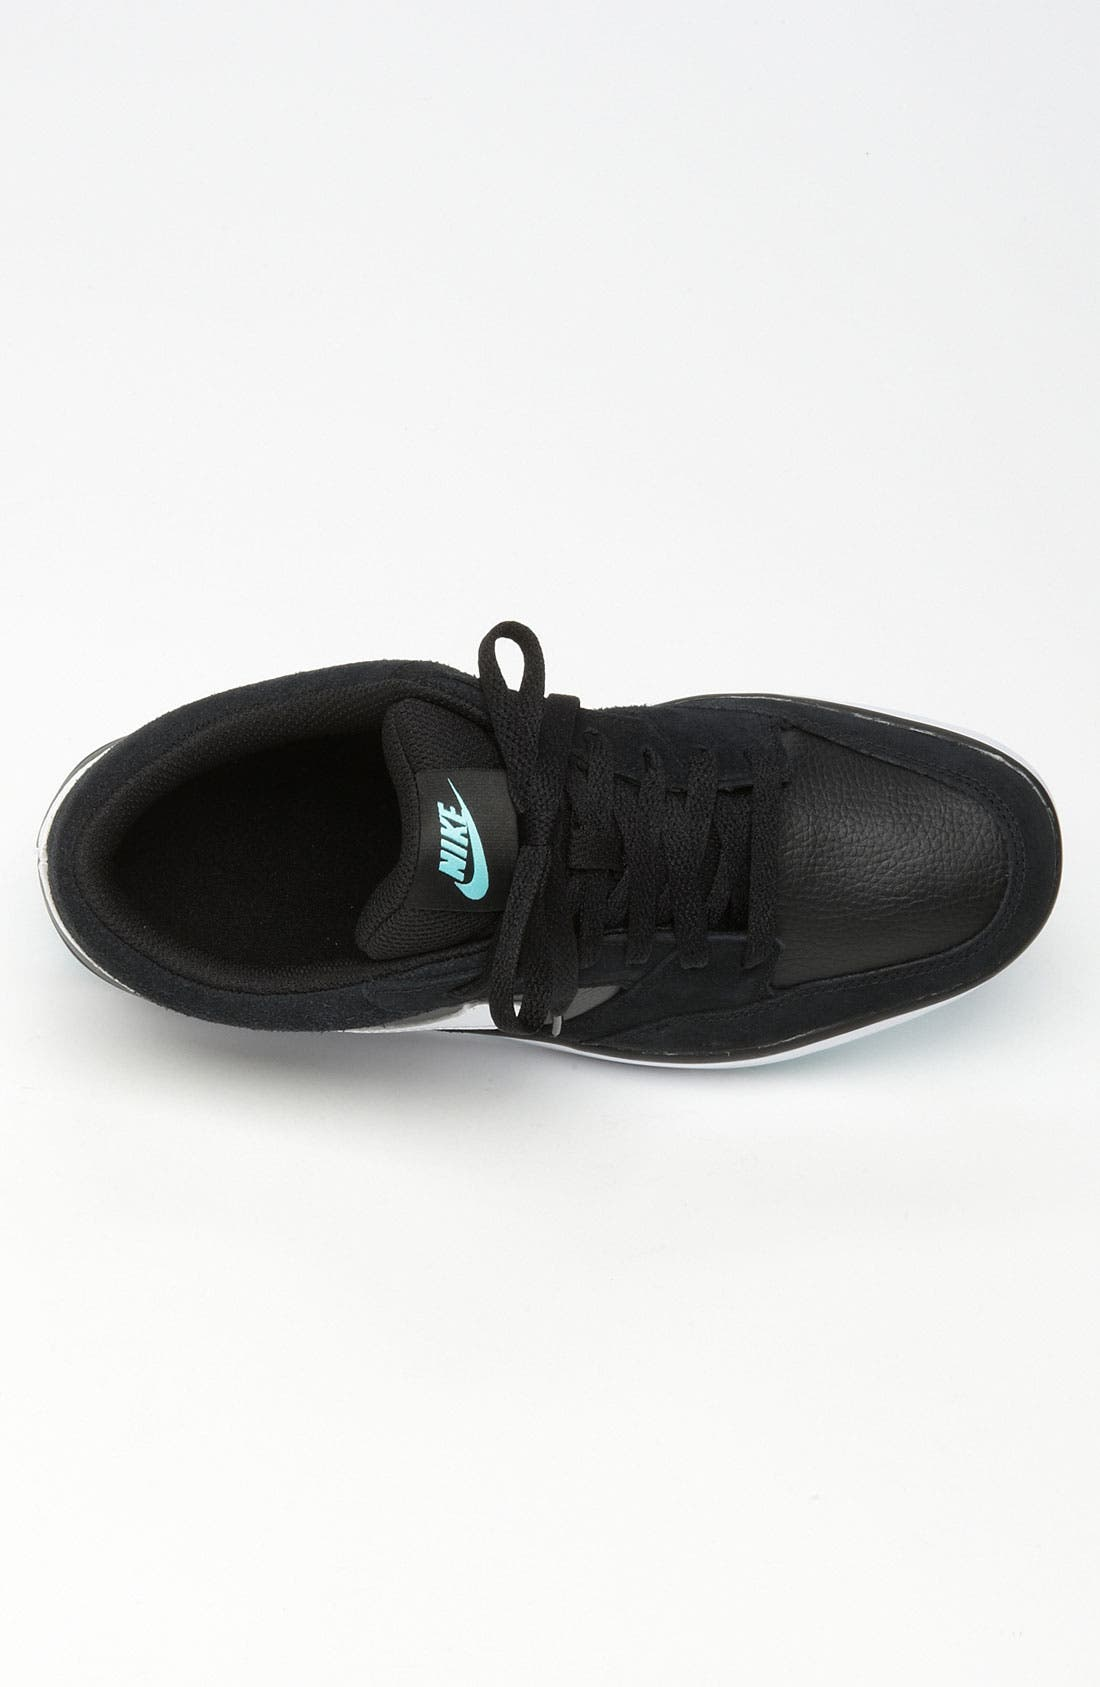 Alternate Image 3  - Nike 'Avid' Sneaker (Men)